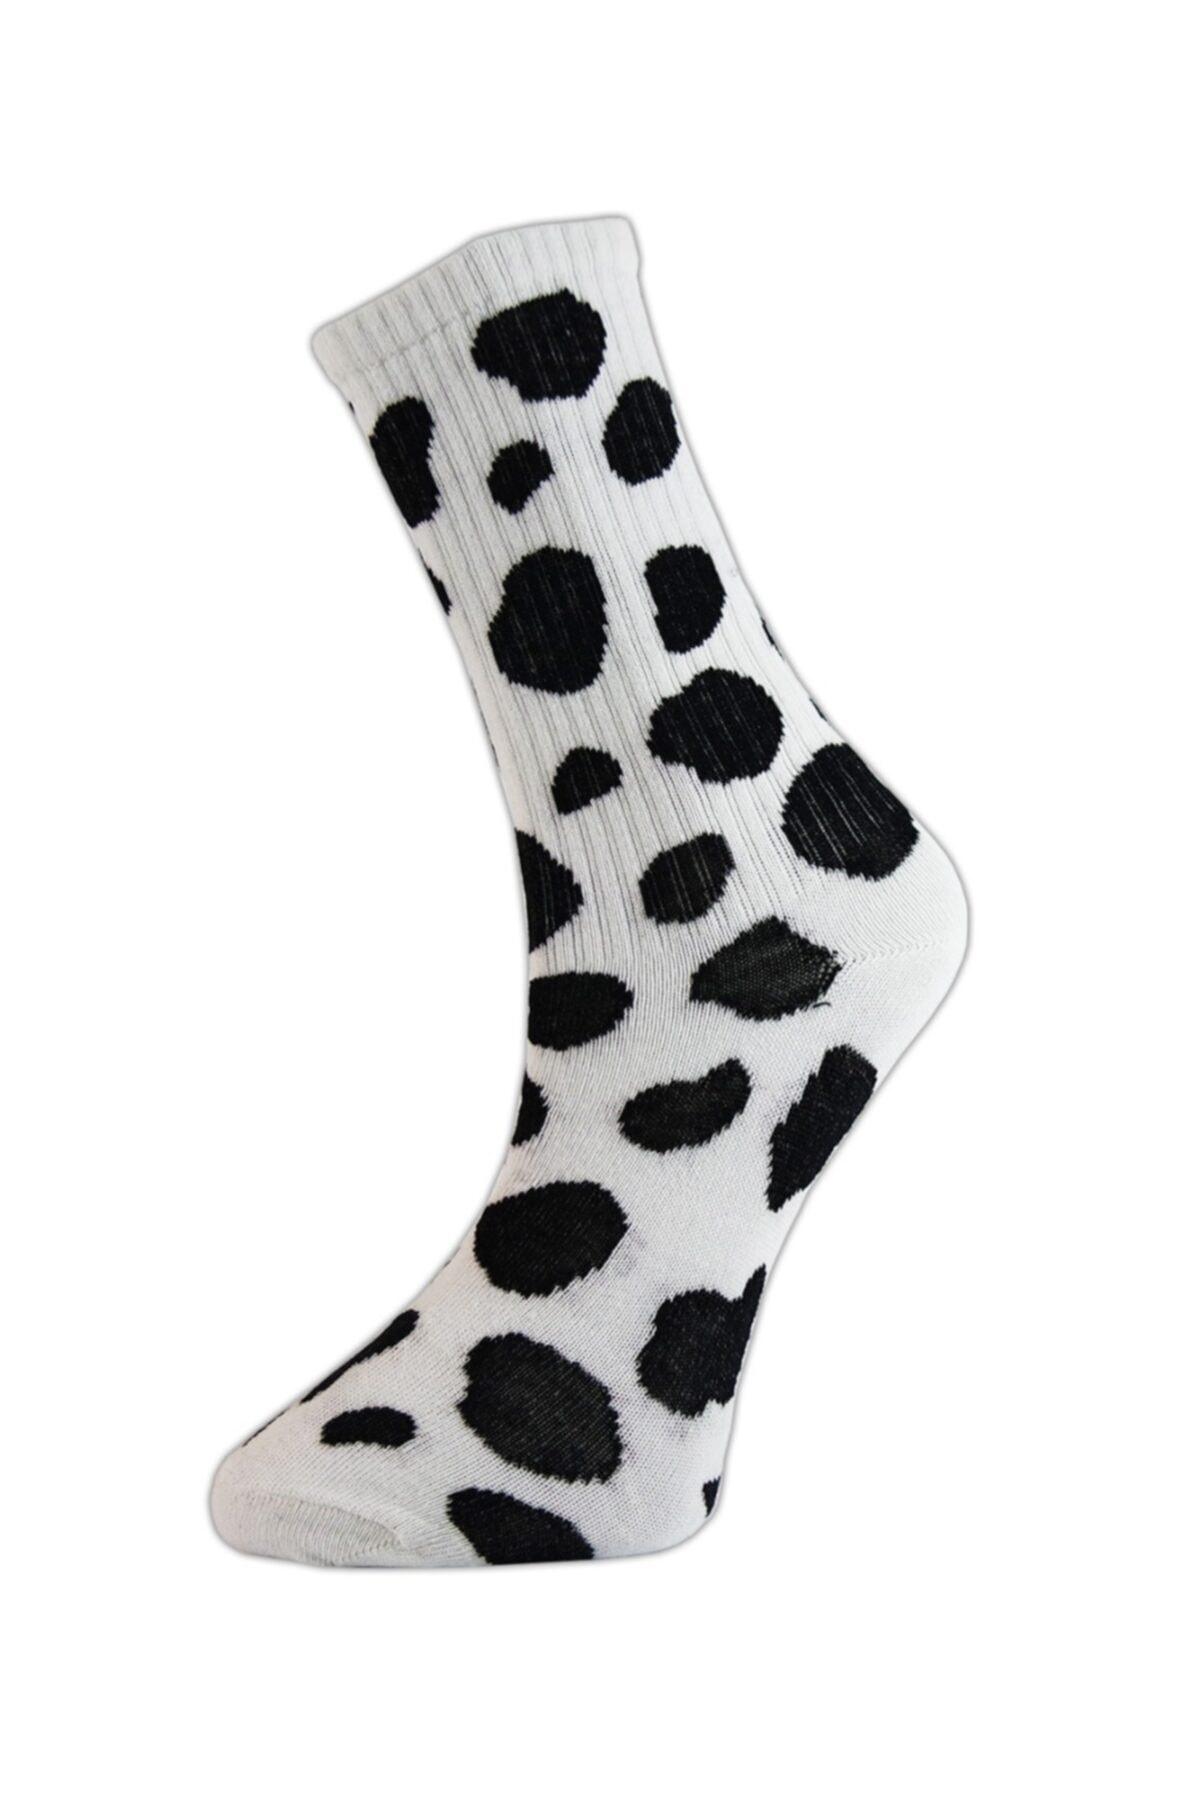 Cool Store Dalmaçyalı Kolej Çorap 1